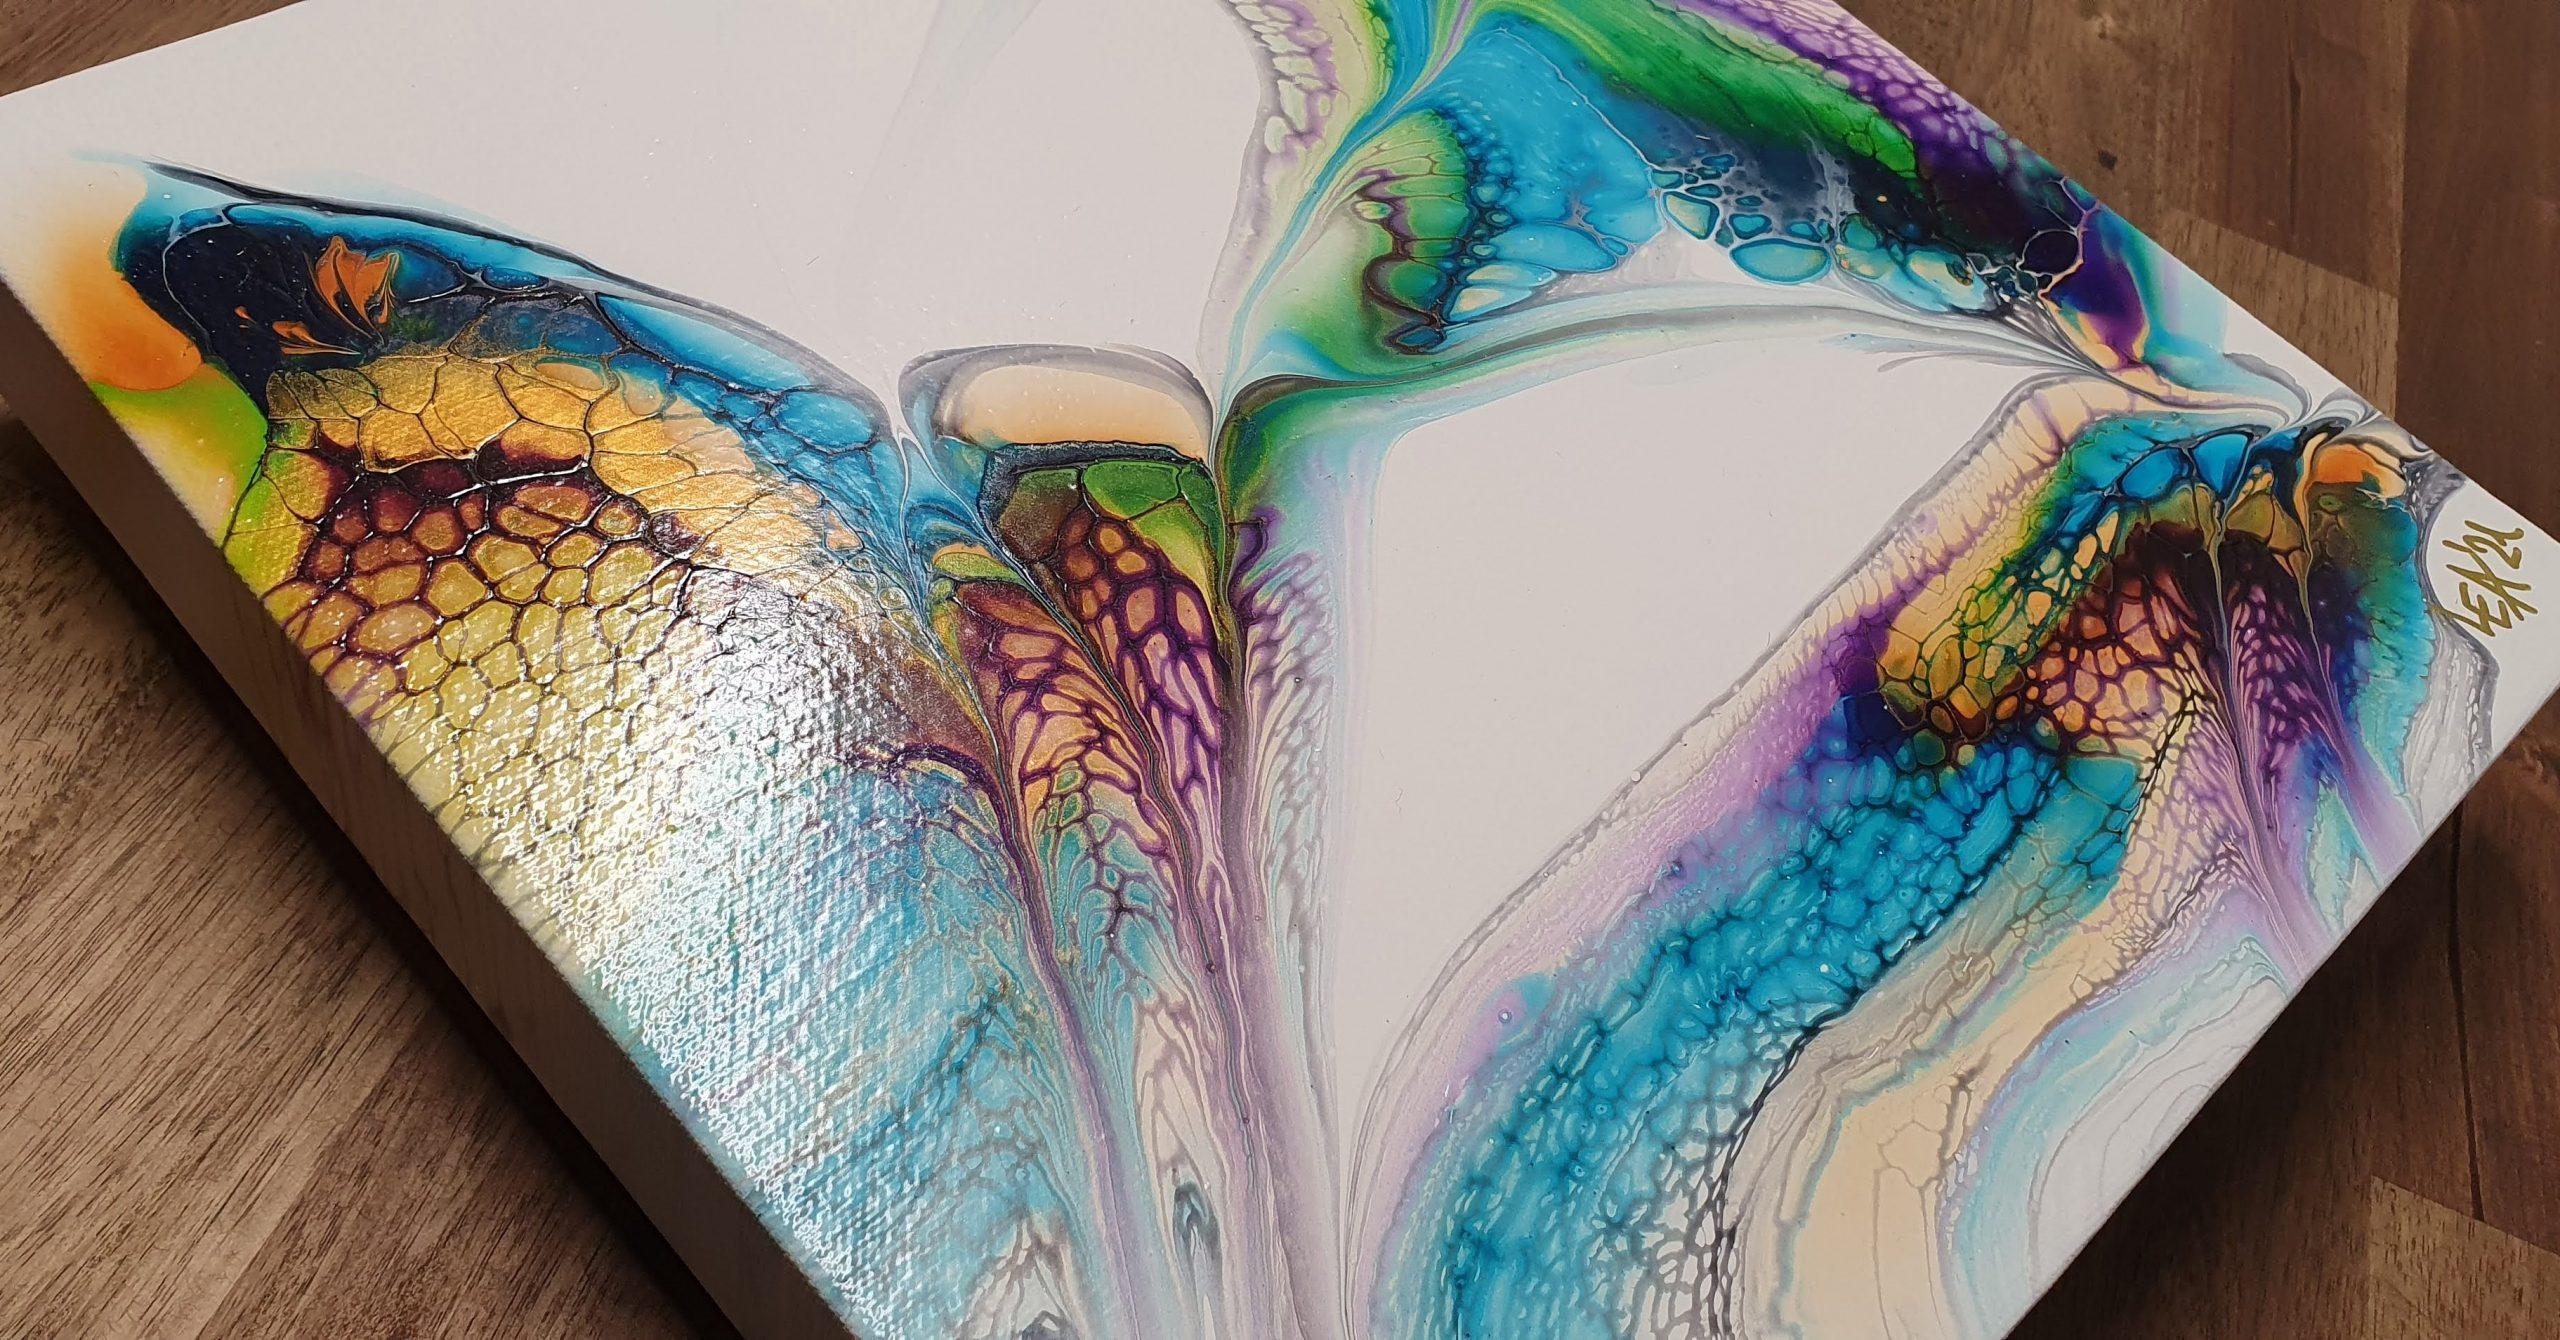 Vivid 1 Fluidart Acrylgiessen Swipe 2